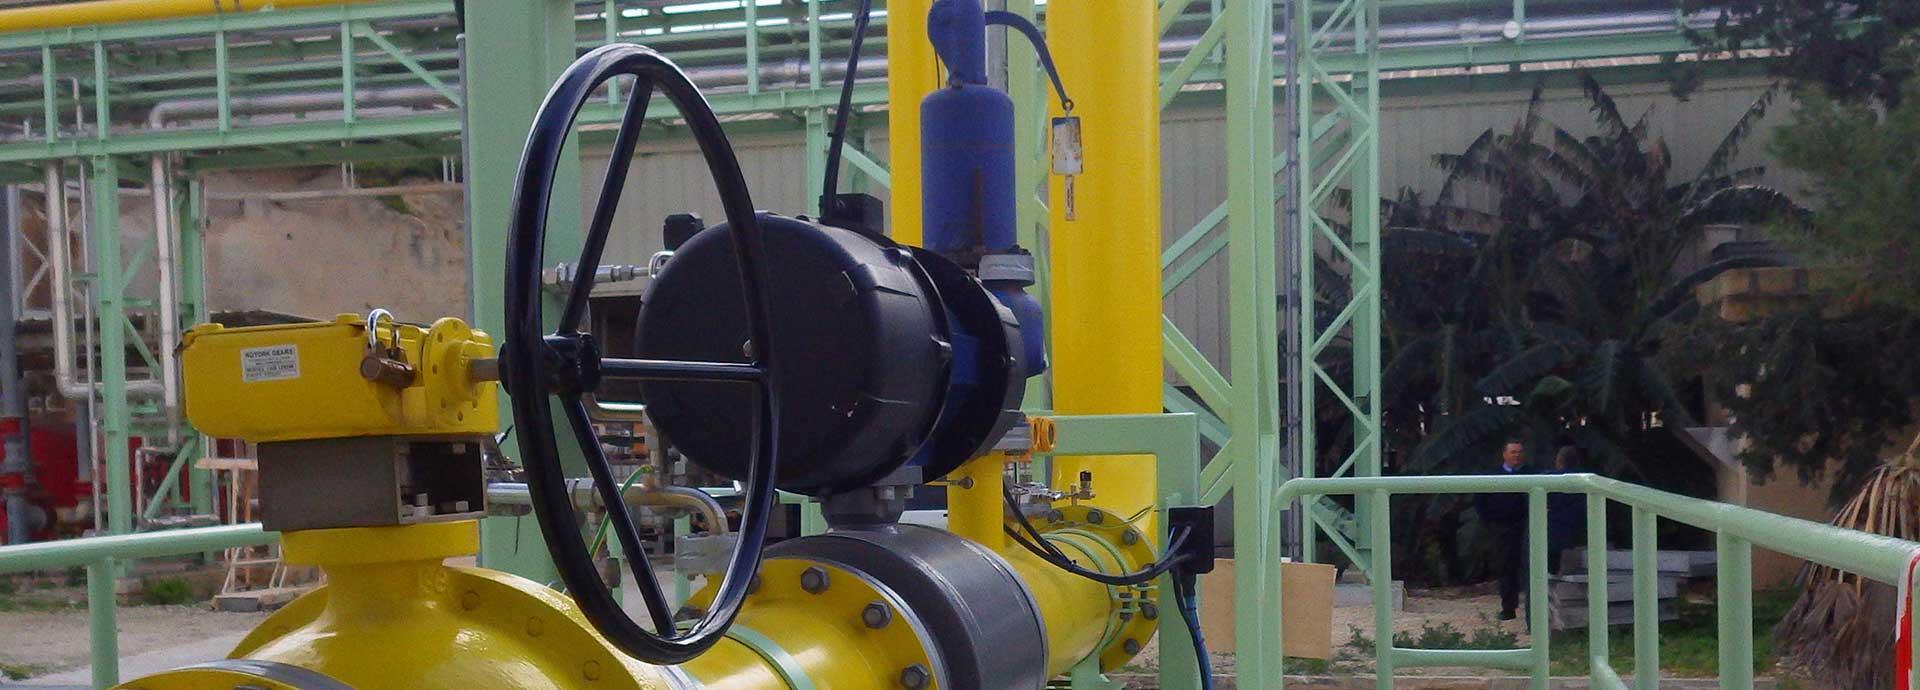 Malta prepares for an LNG-powered future